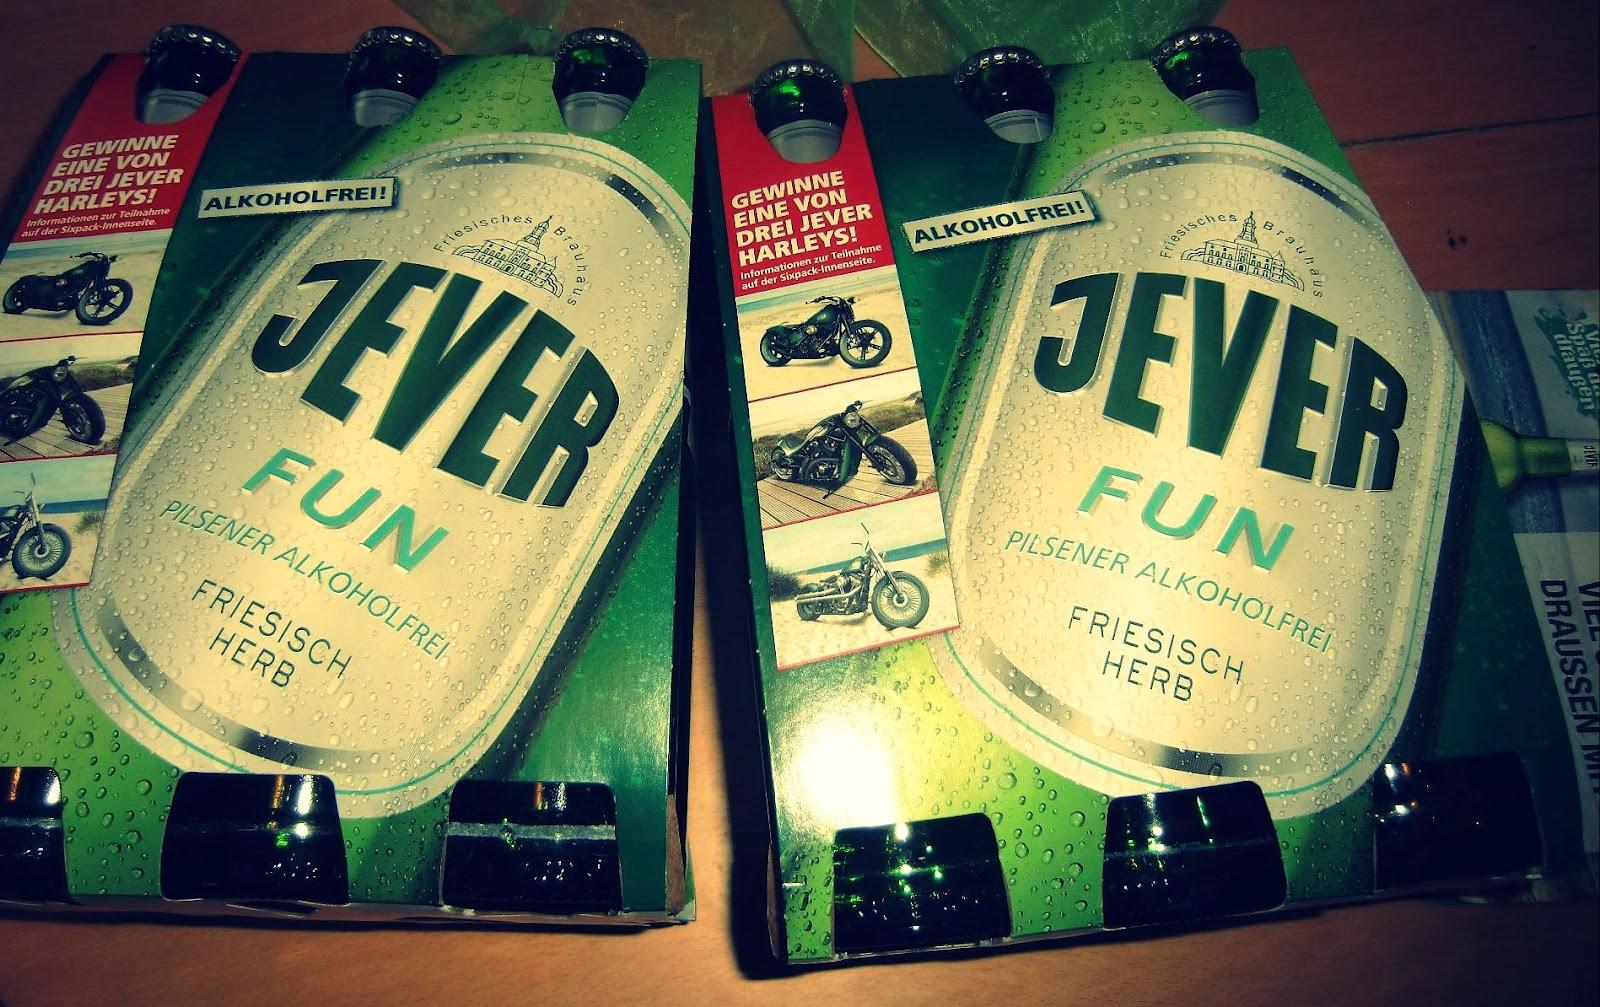 Mini Kühlschrank Jever : Elassunnyside: brandnooz produkttest: jever fun alkoholfrei